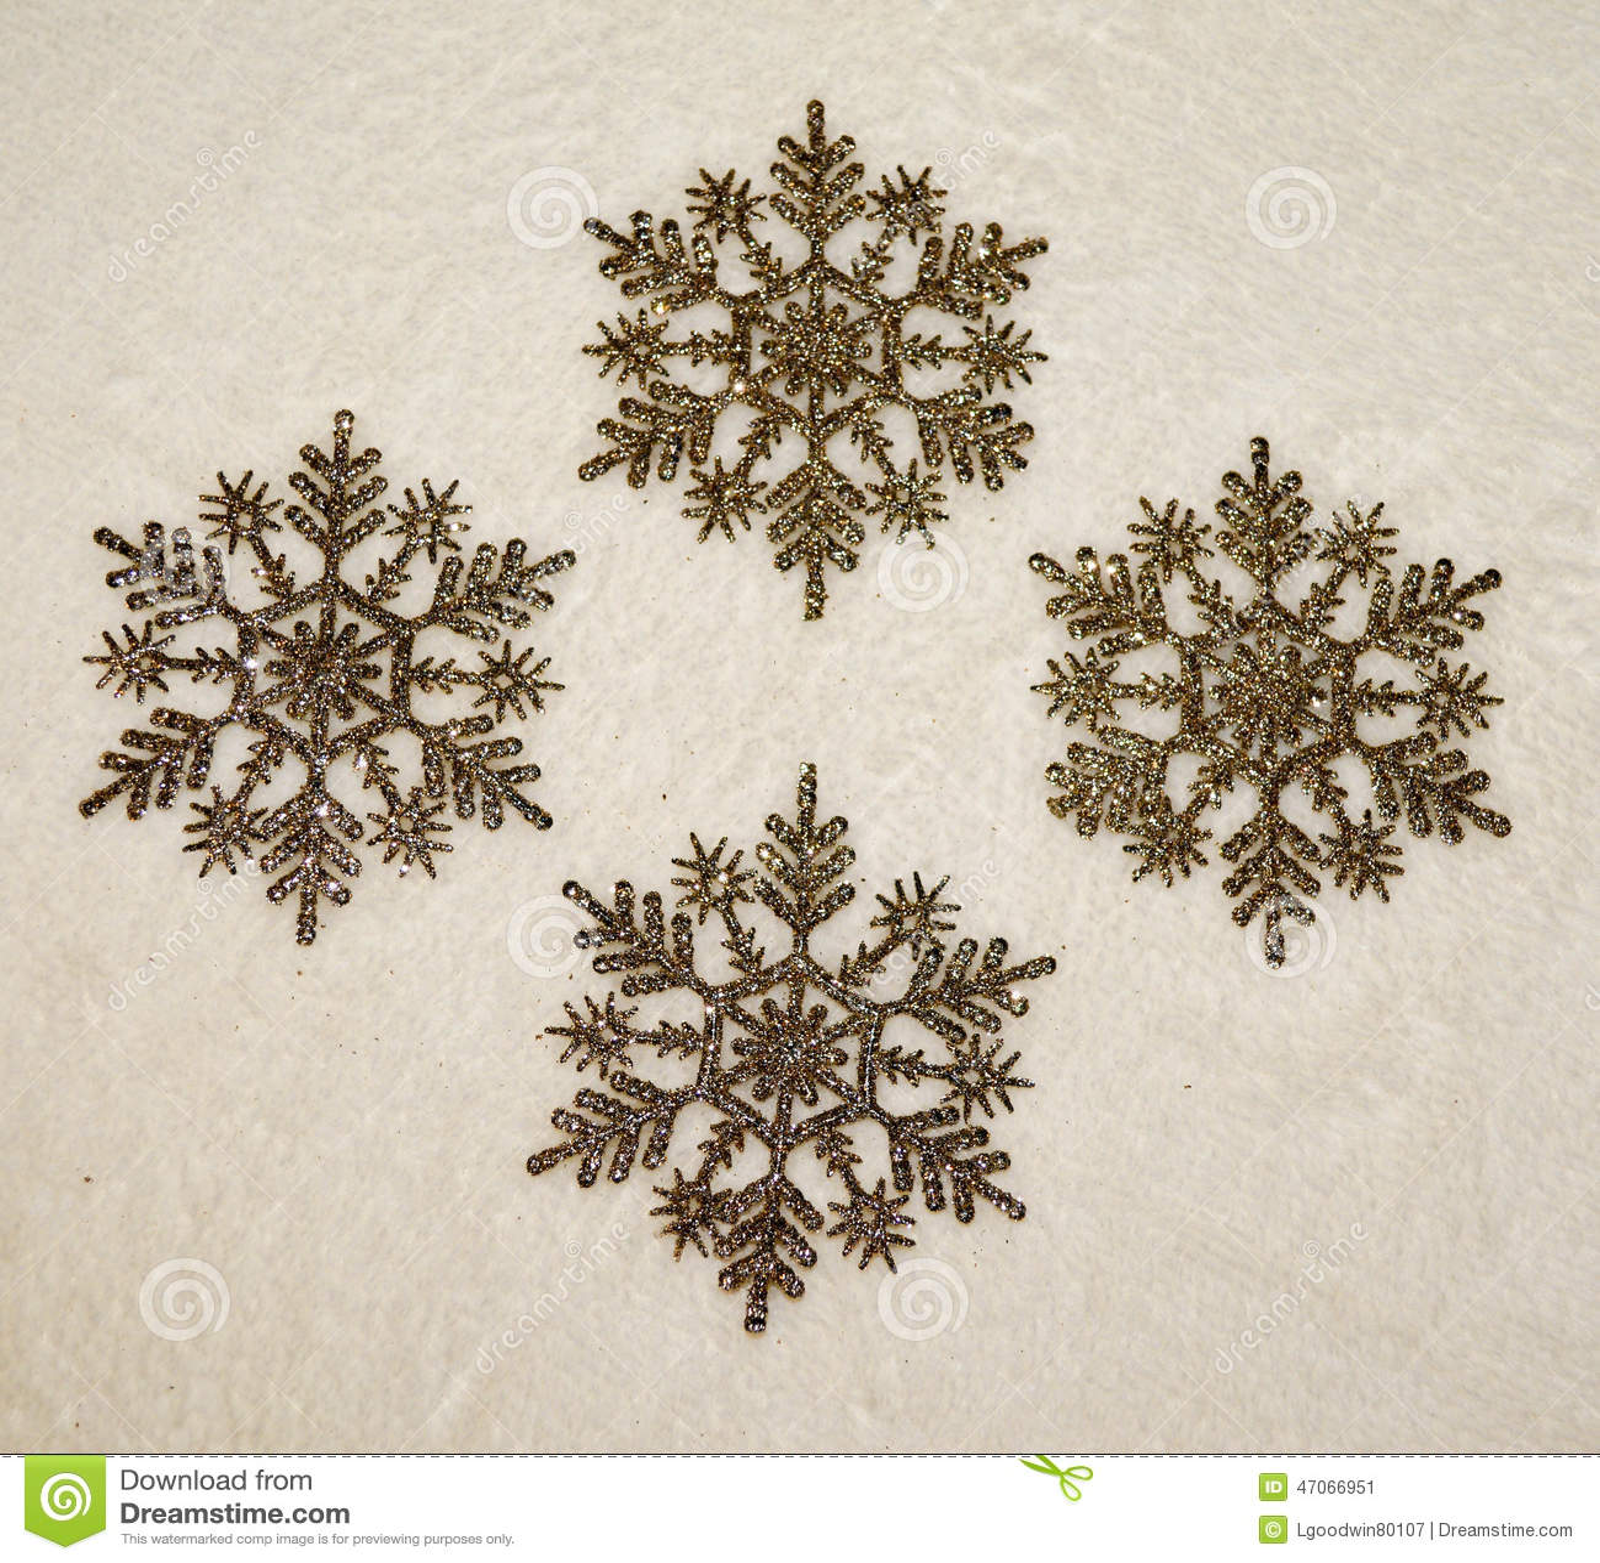 Snowflakes ornaments - Golden Glitter Snowflakes Ornaments